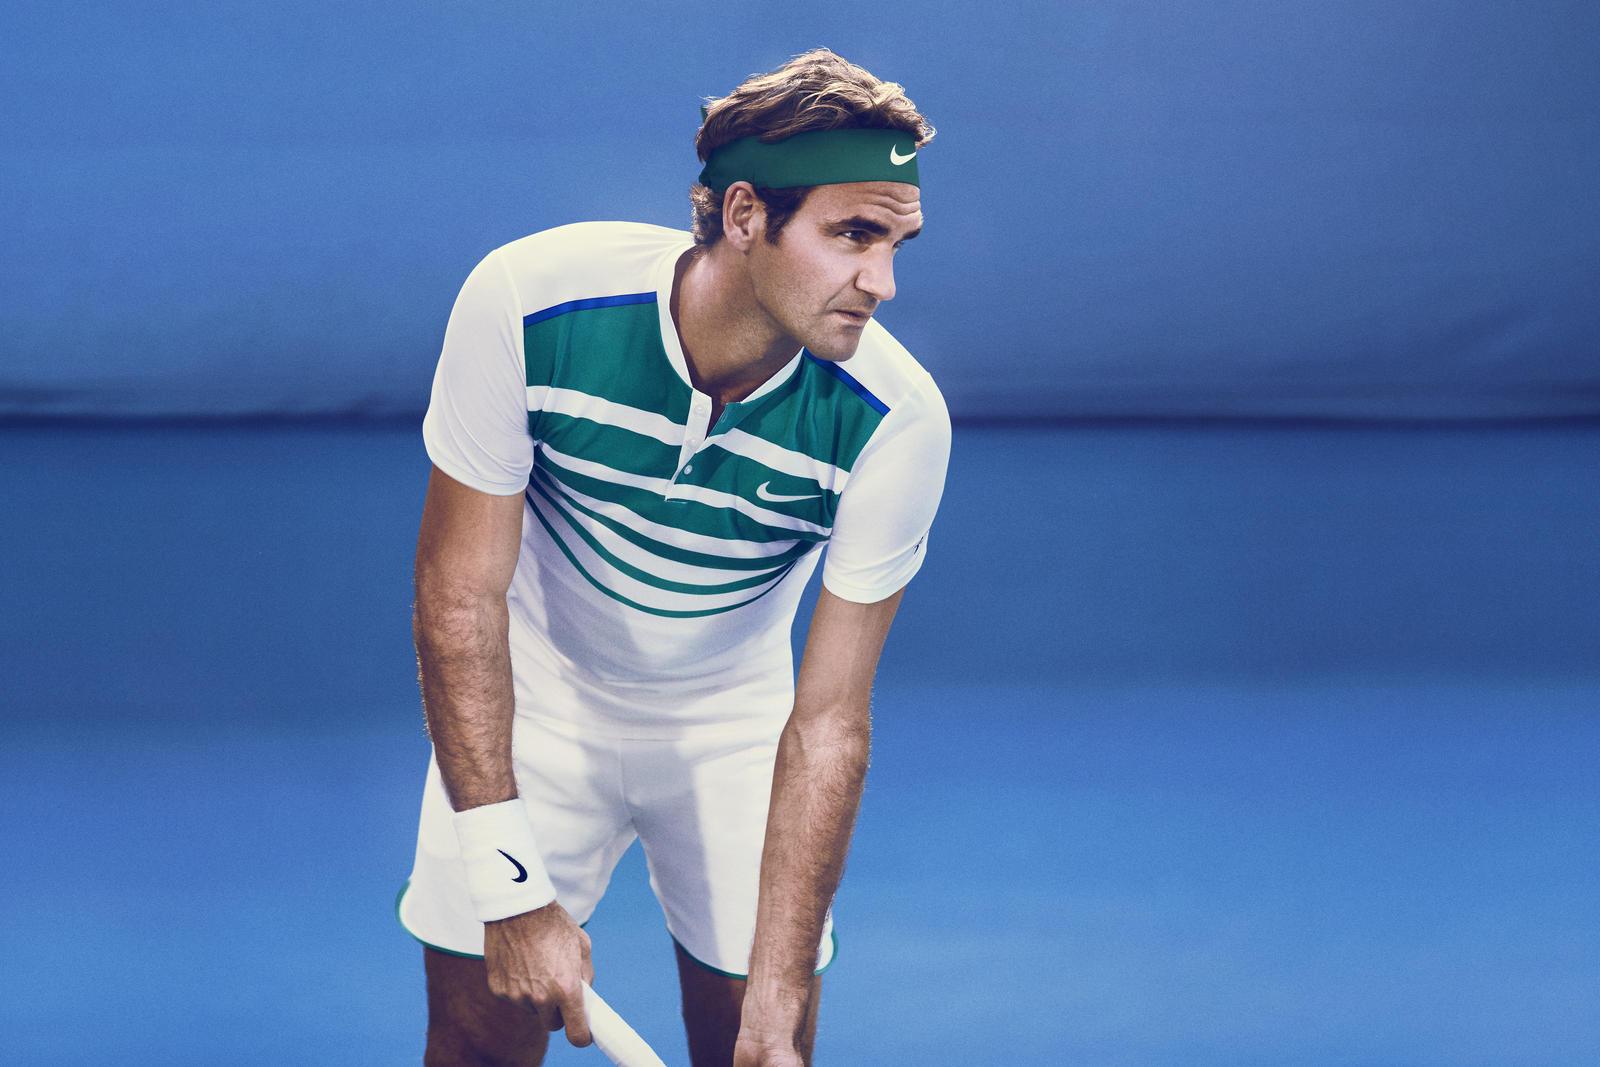 Roger Federer Nike outfit australian open 2016 tennis